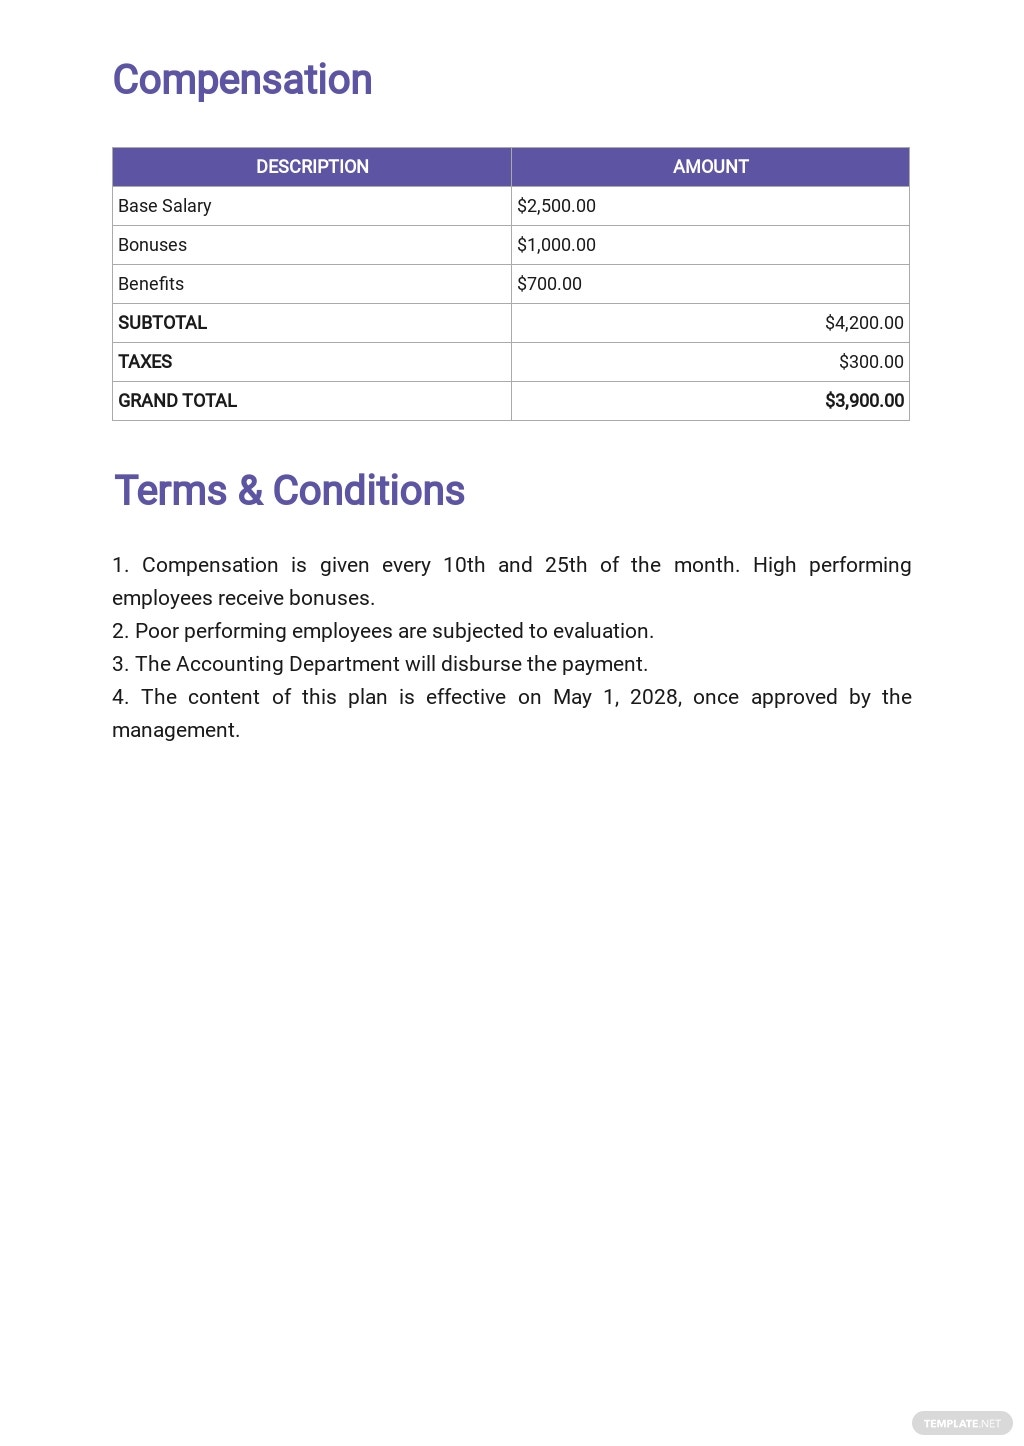 Sample Sales Compensation Plan Template [Free PDF] - Google Docs, Word